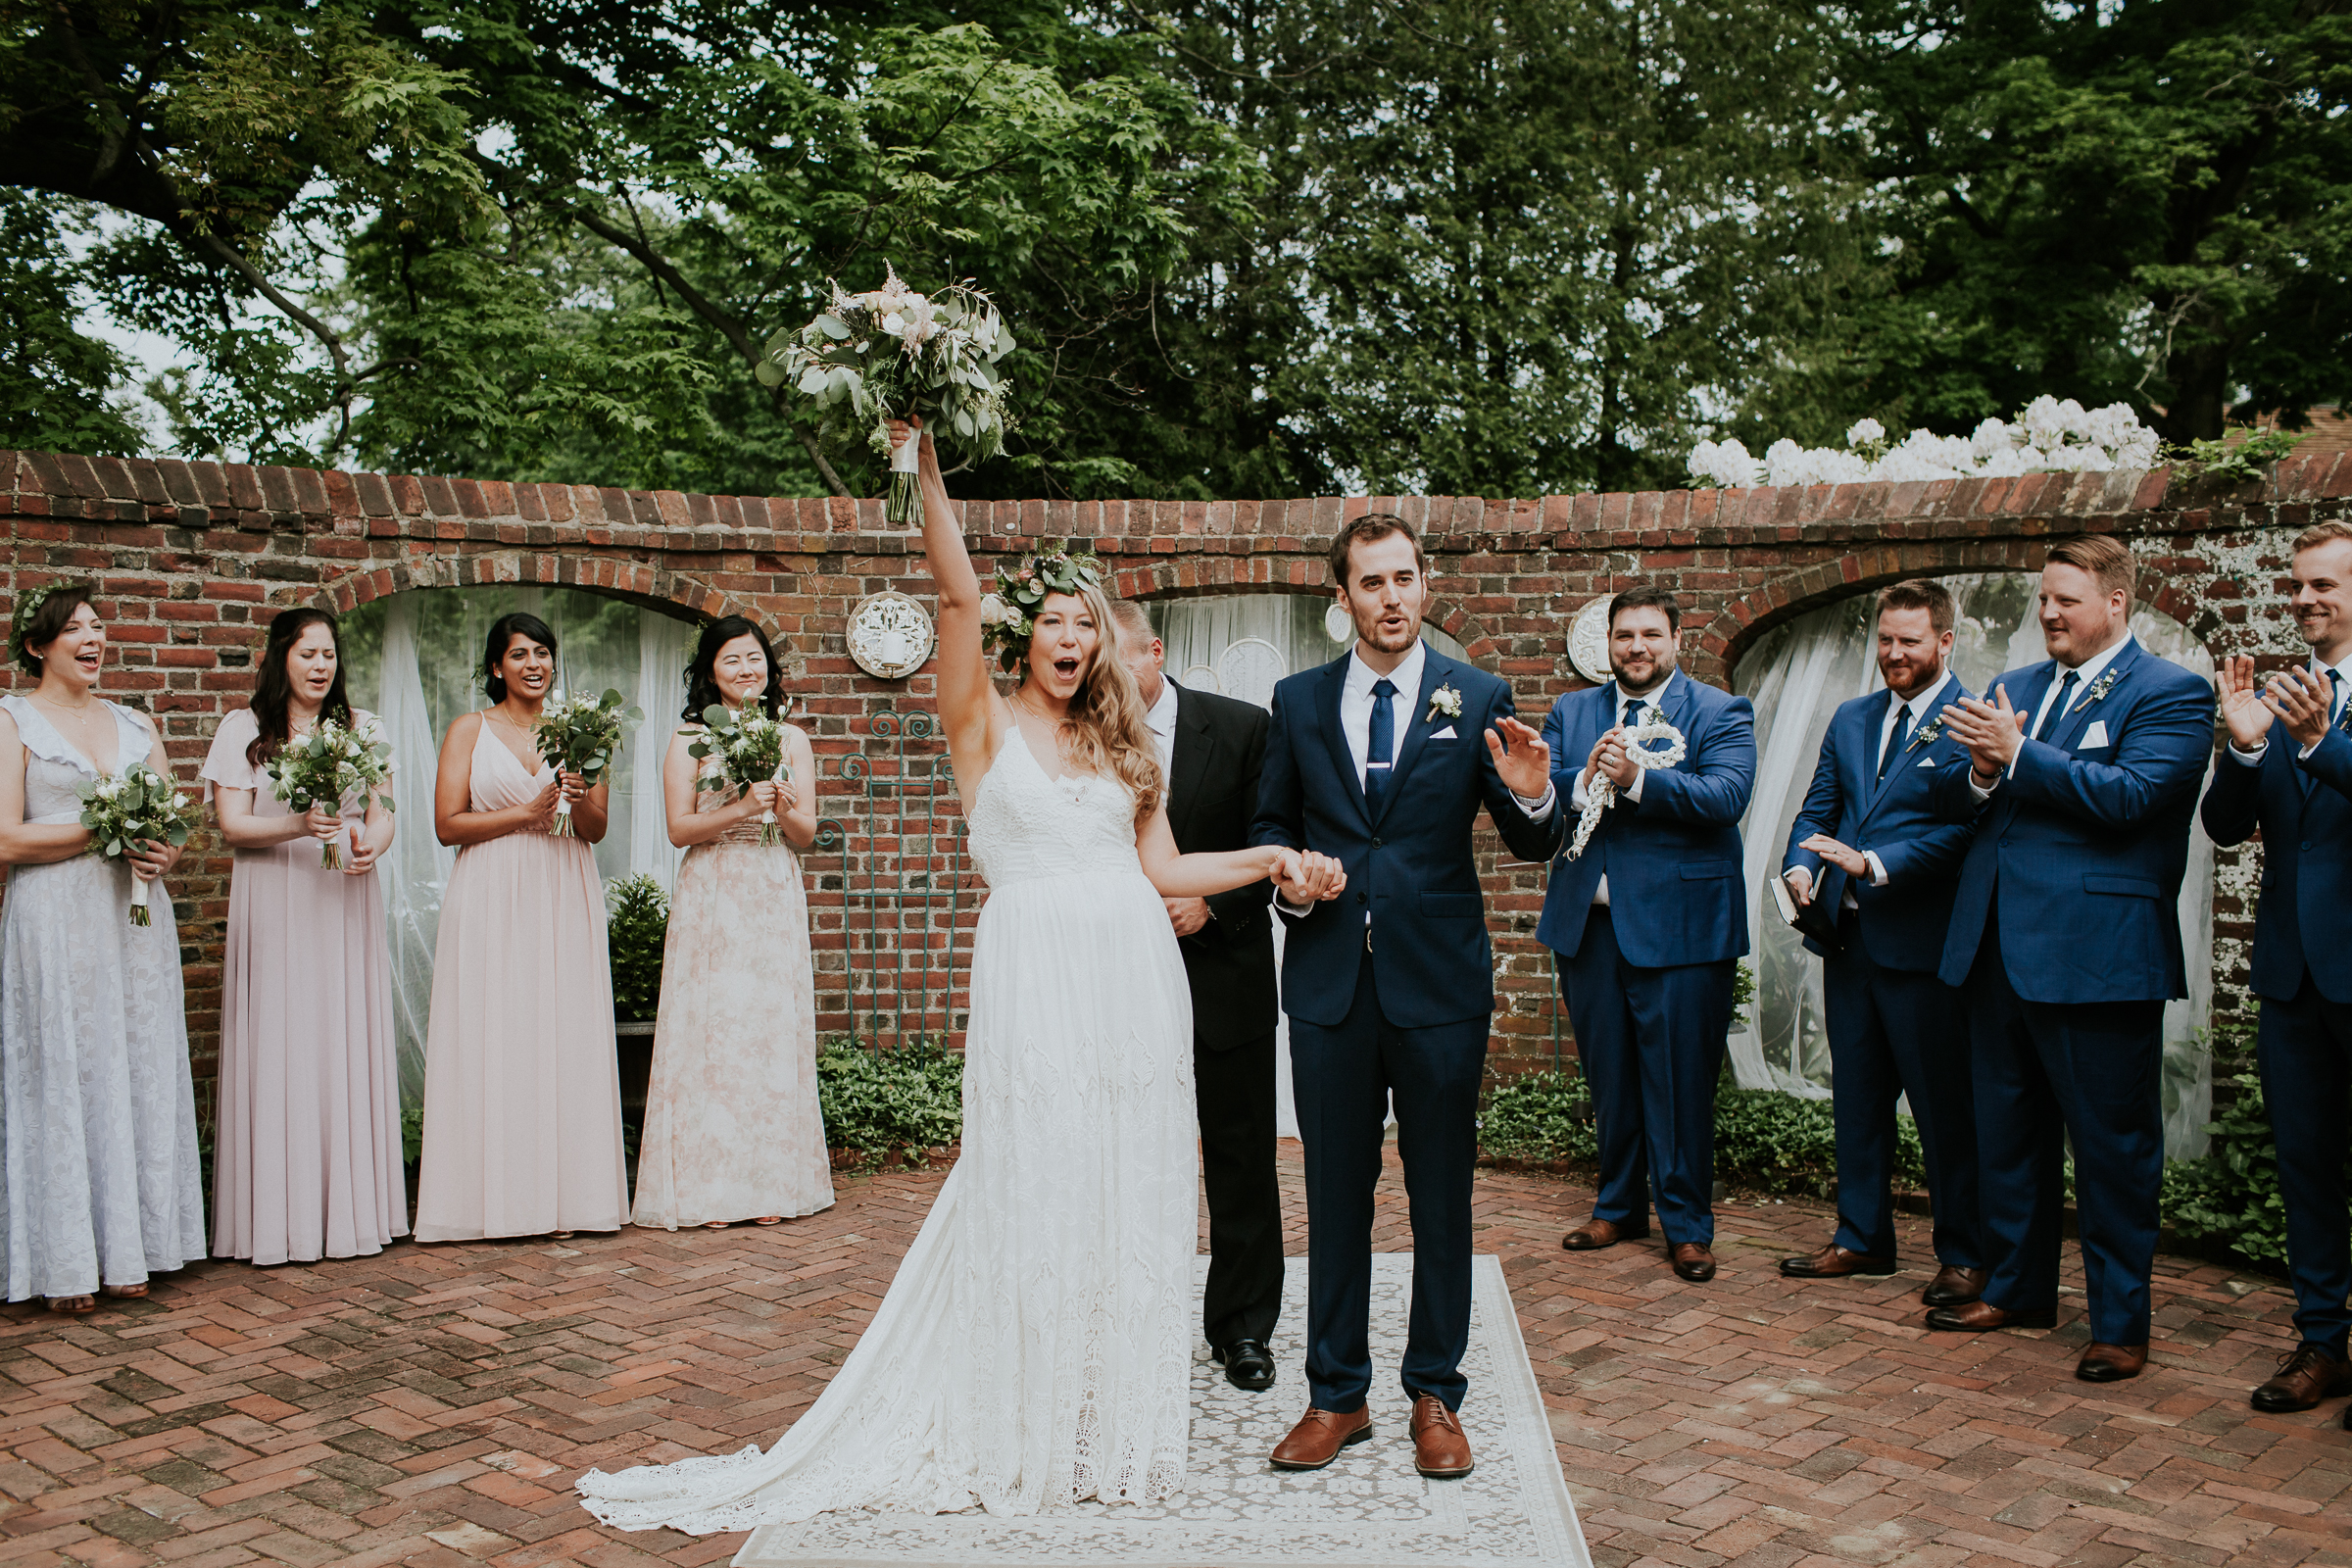 New-York-Documentary-Wedding-Photography-Best-Of-2017-by-Elvira-Kalviste-Photography-5.jpg